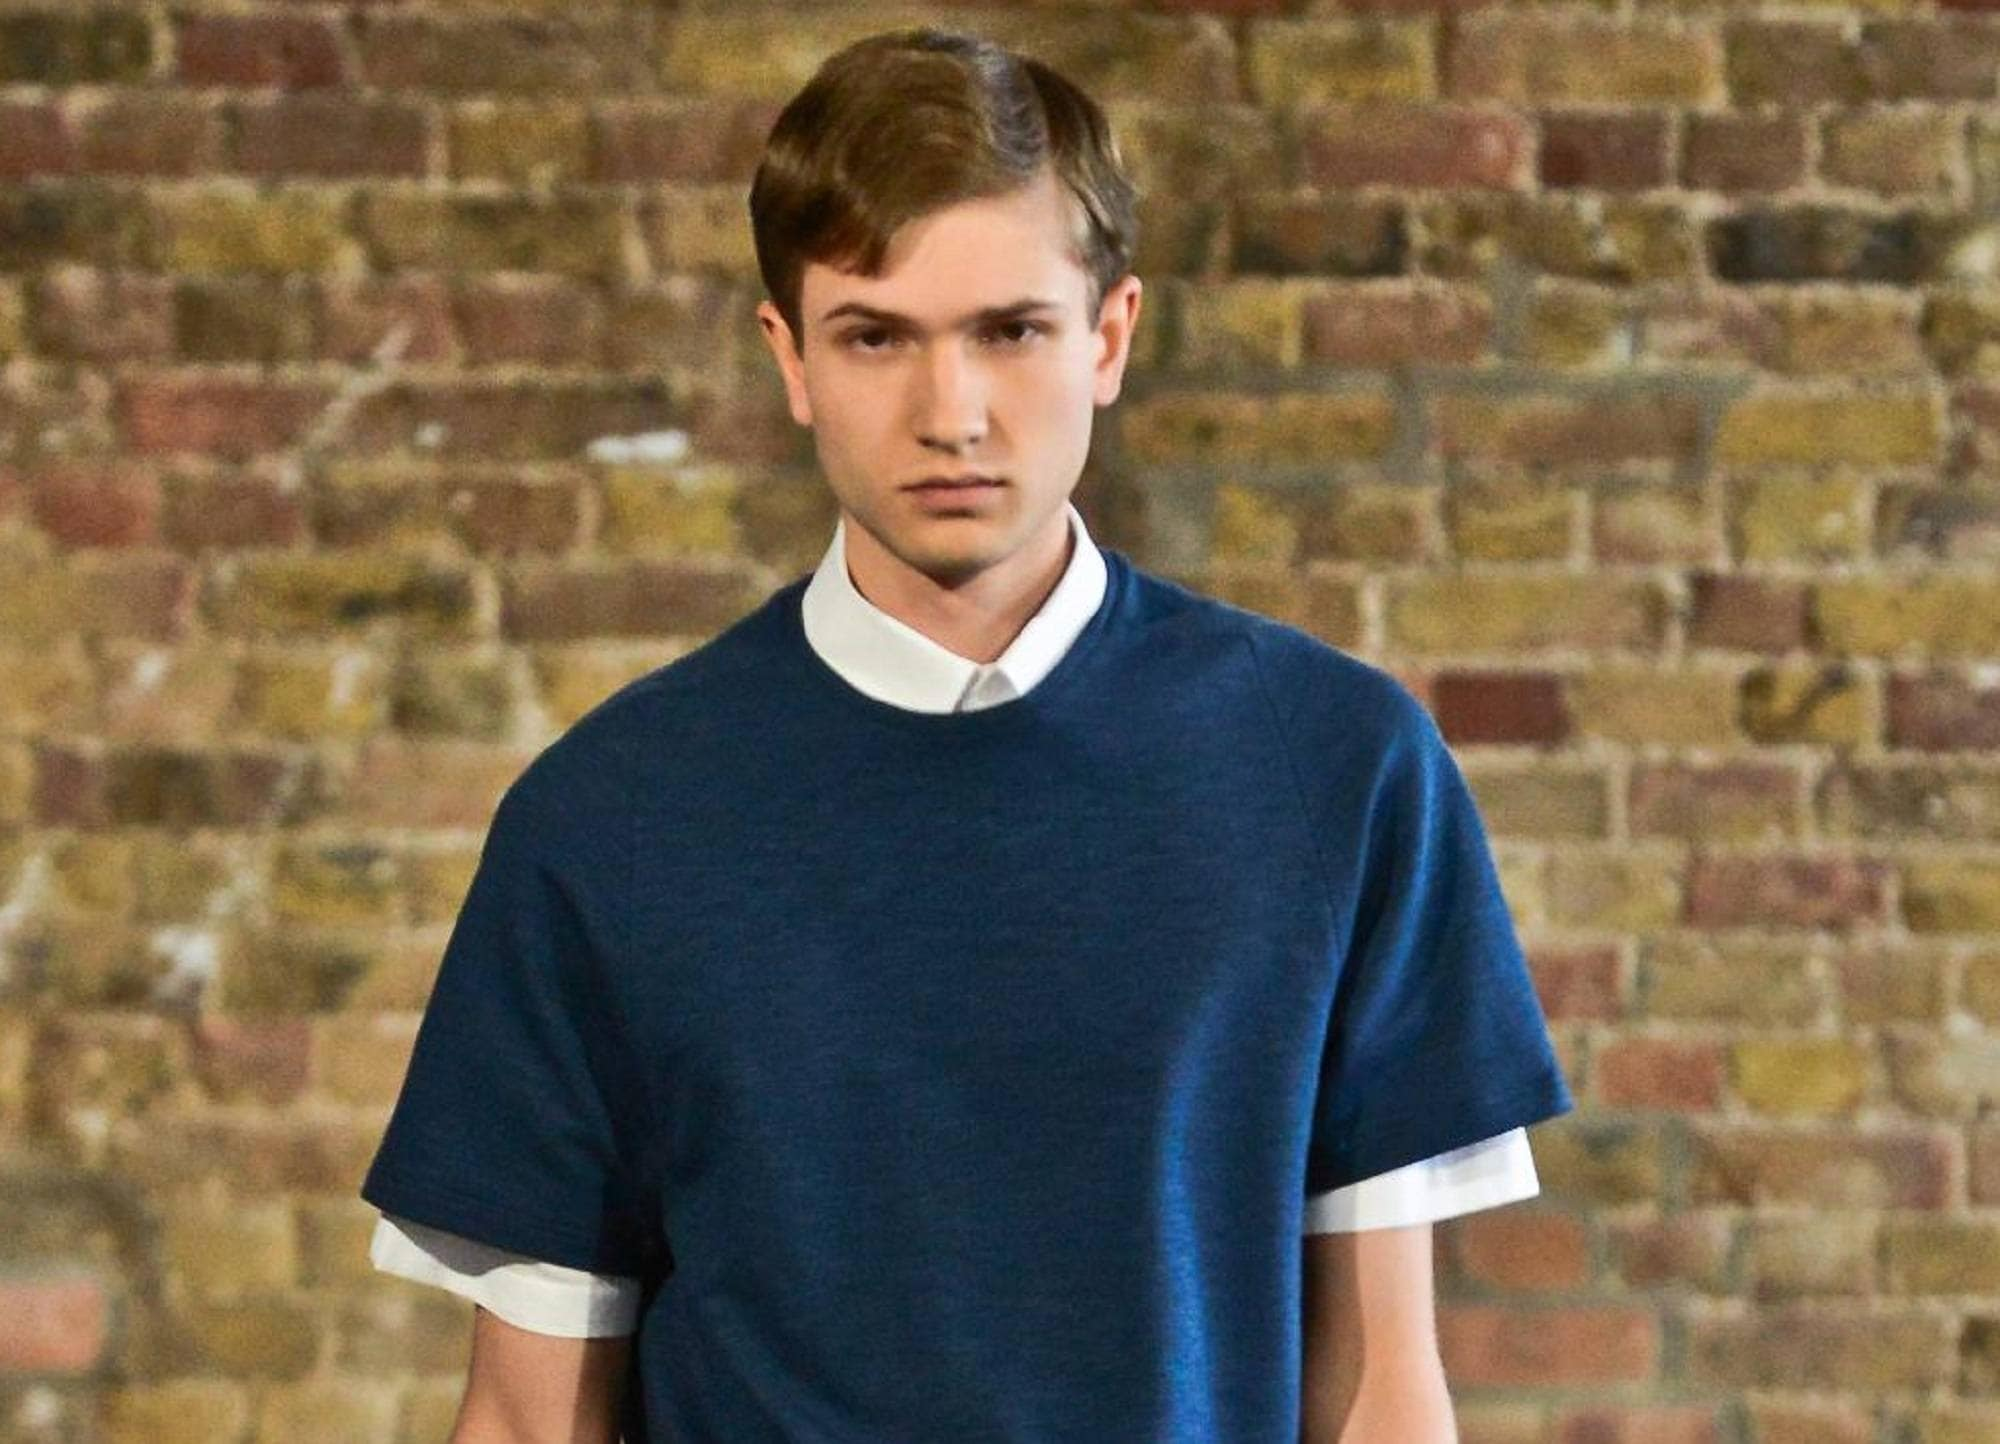 Best hair color for men: Caucasian man with bronde hair wearing a dark blue shirt against a brick wall